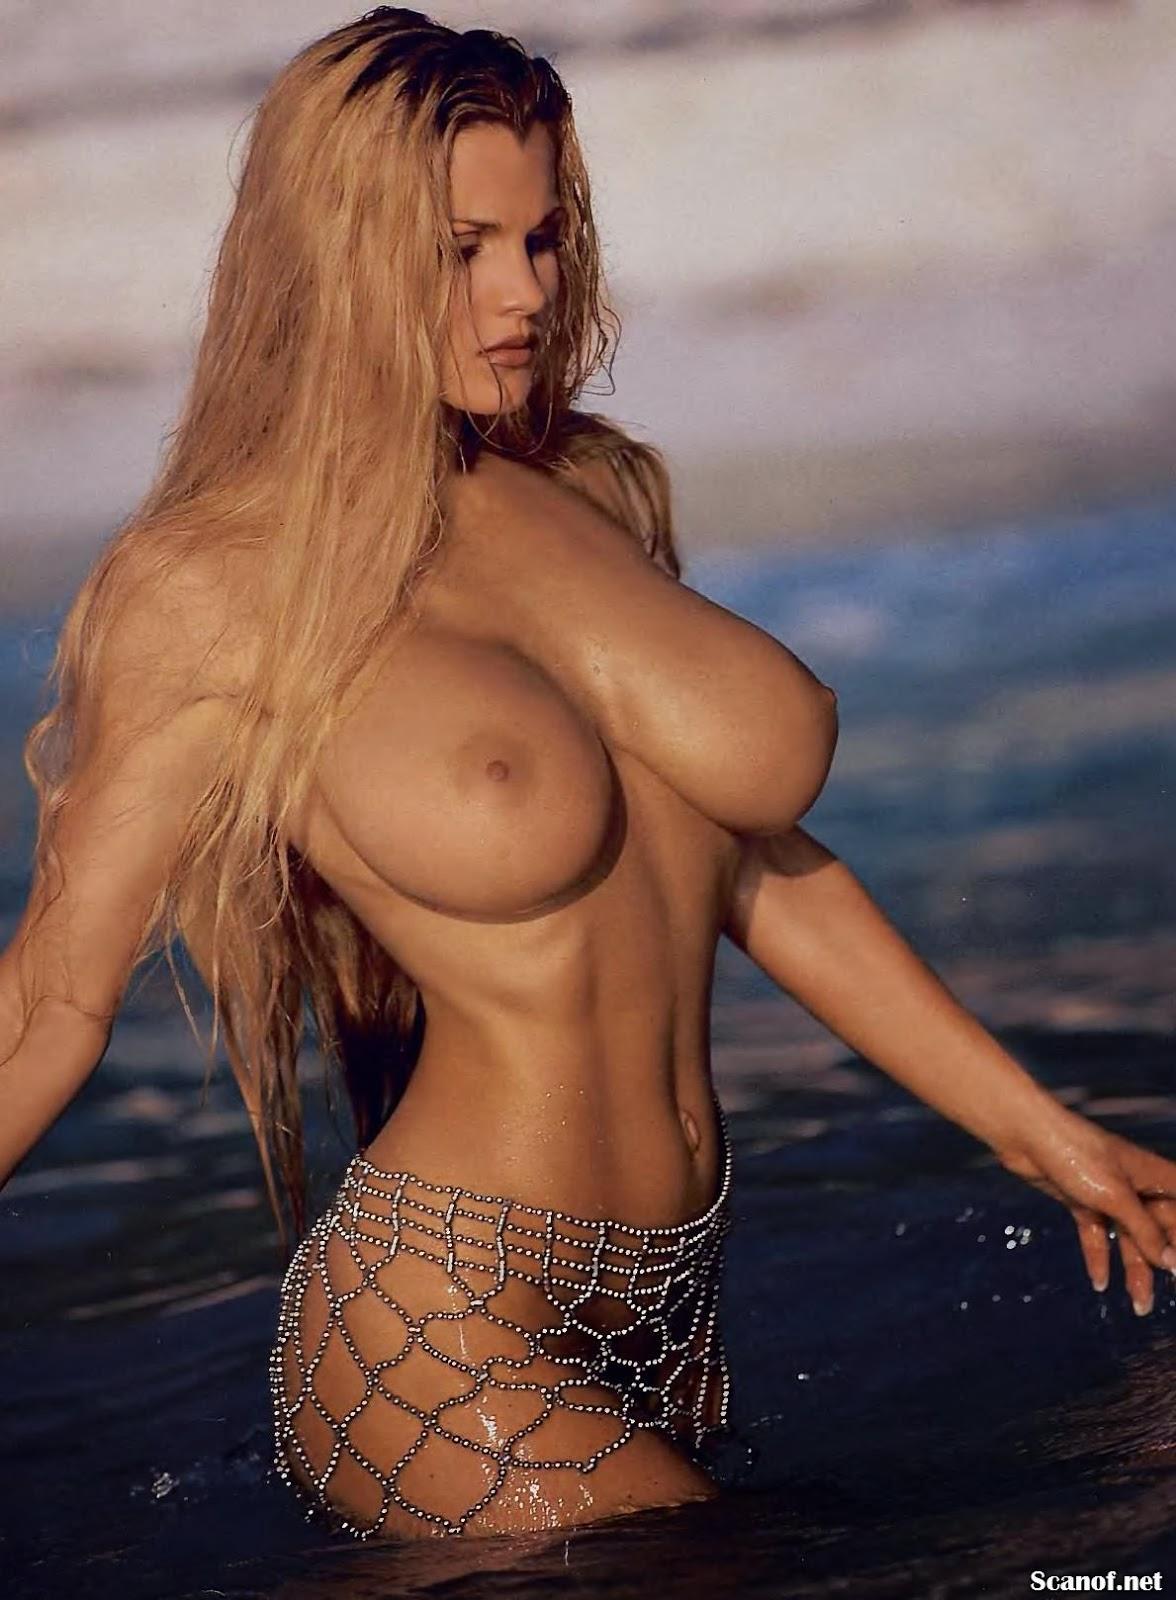 The Babes of Baywatch | Playboy USA [June 1998] | Magazine ...